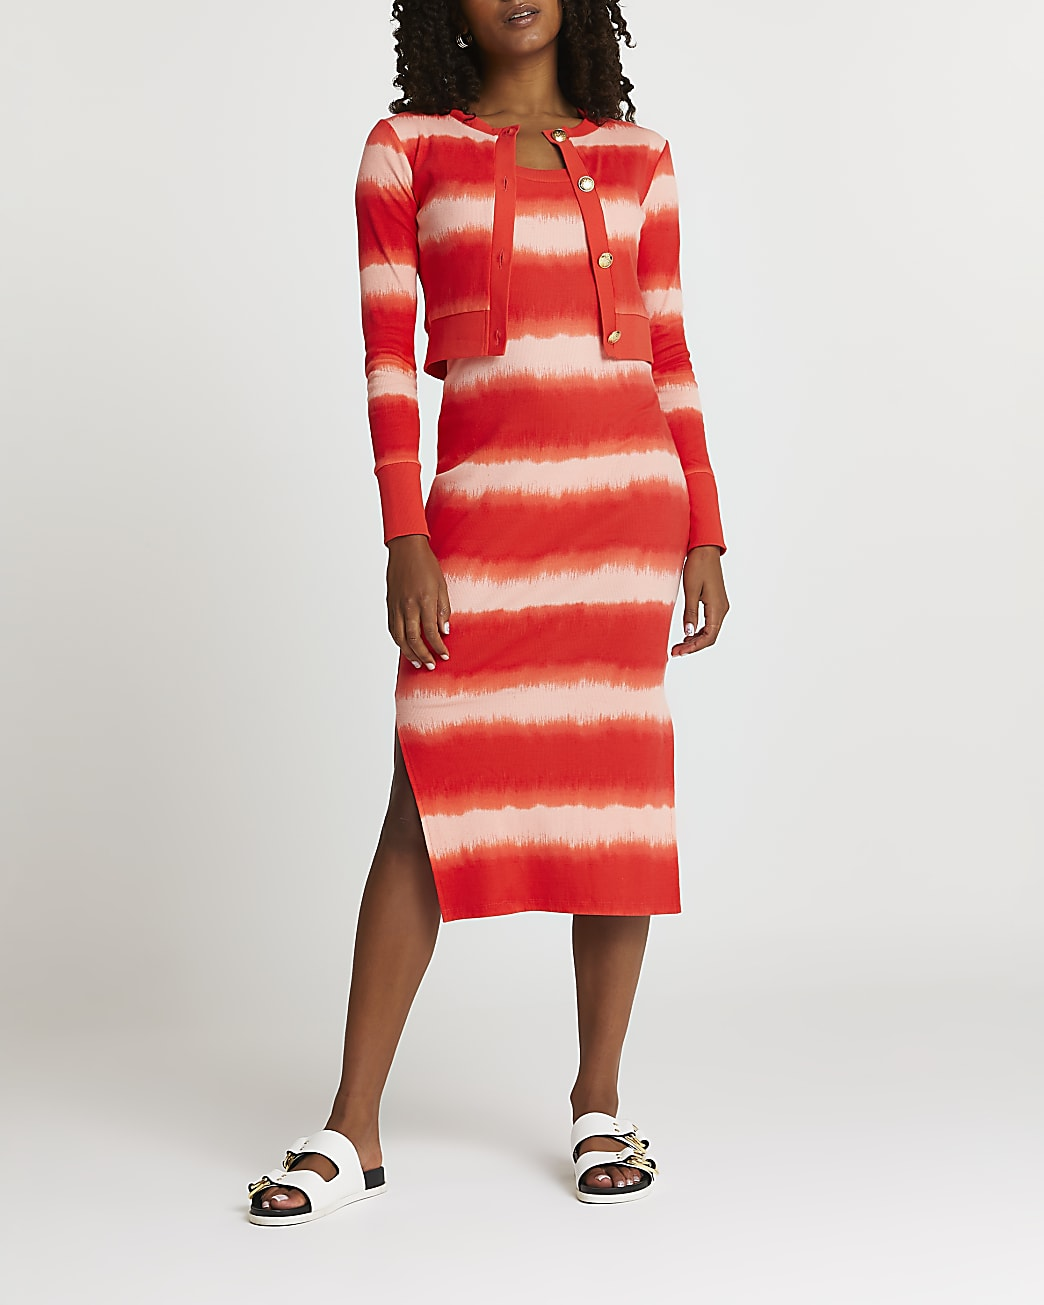 Red tie dye midi dress cardigan set